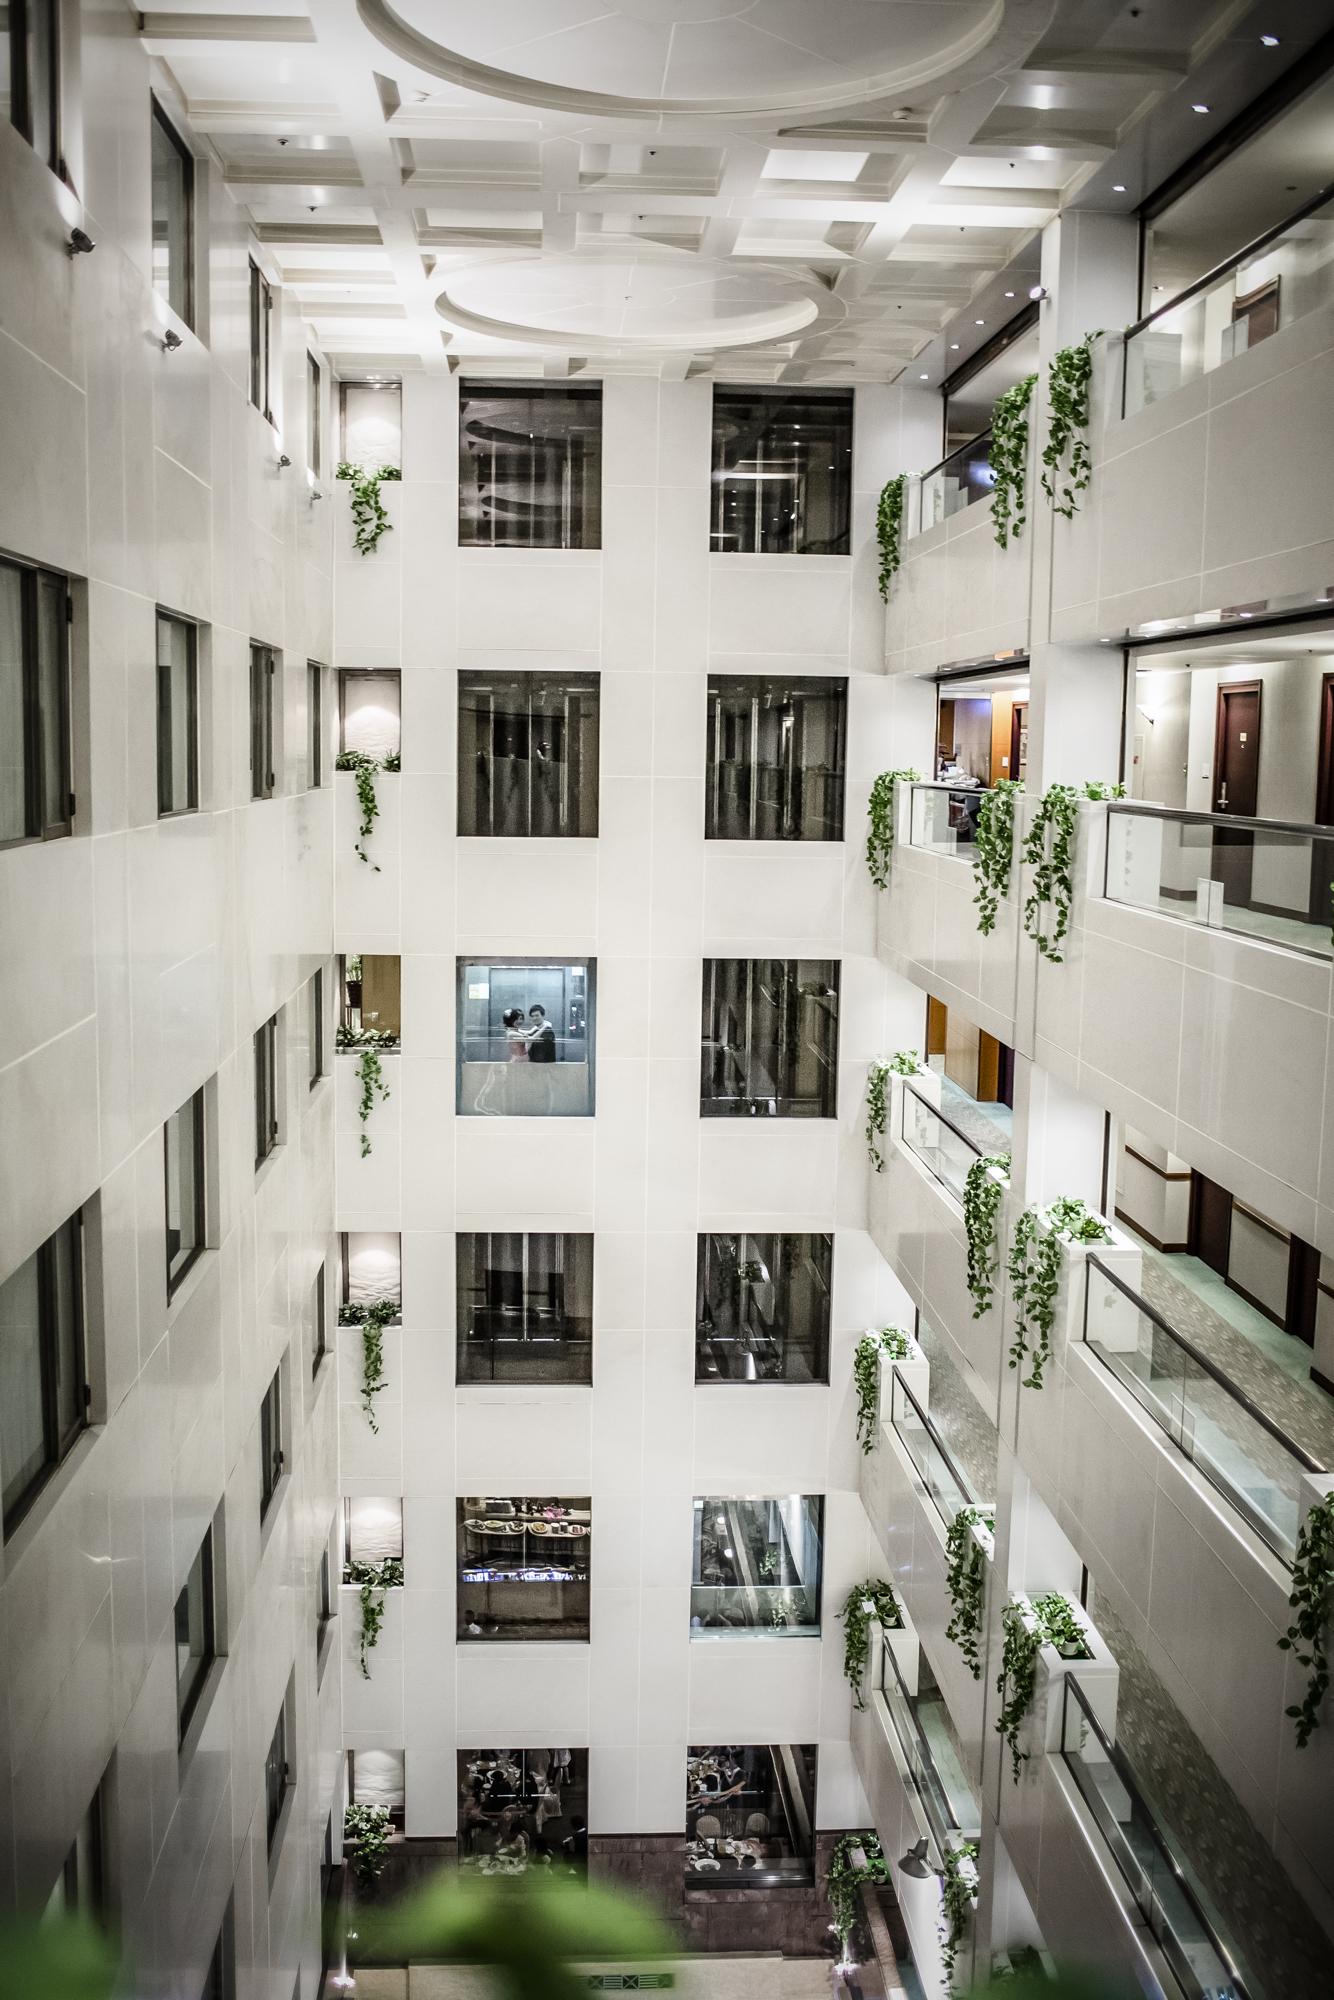 Chinatrust Hotel Jungli 中信大飯店